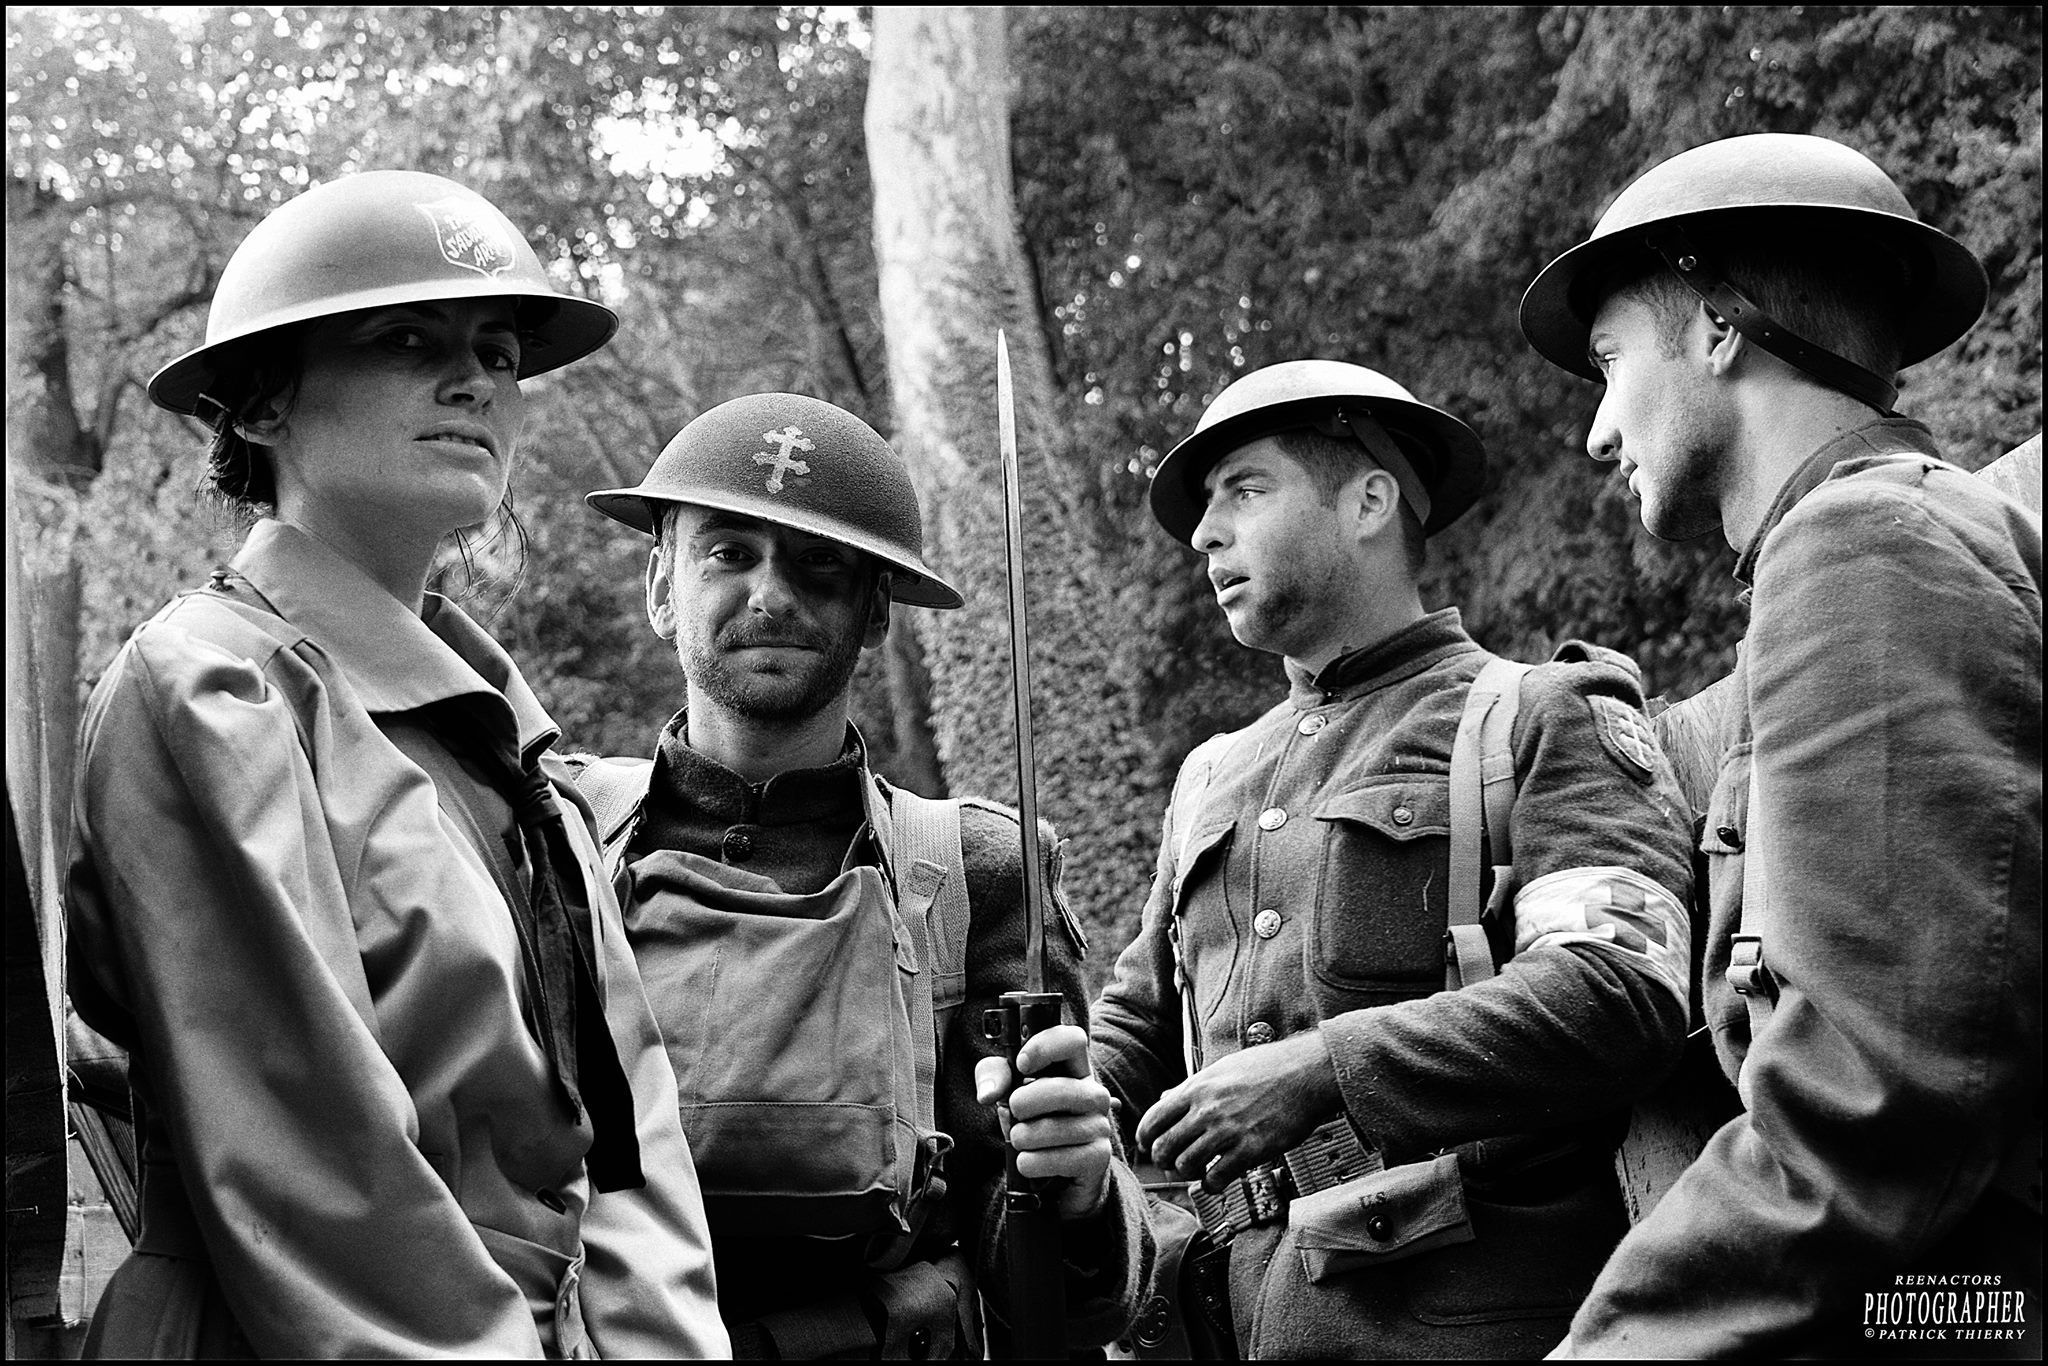 79TH M-G Poissy en uniformes